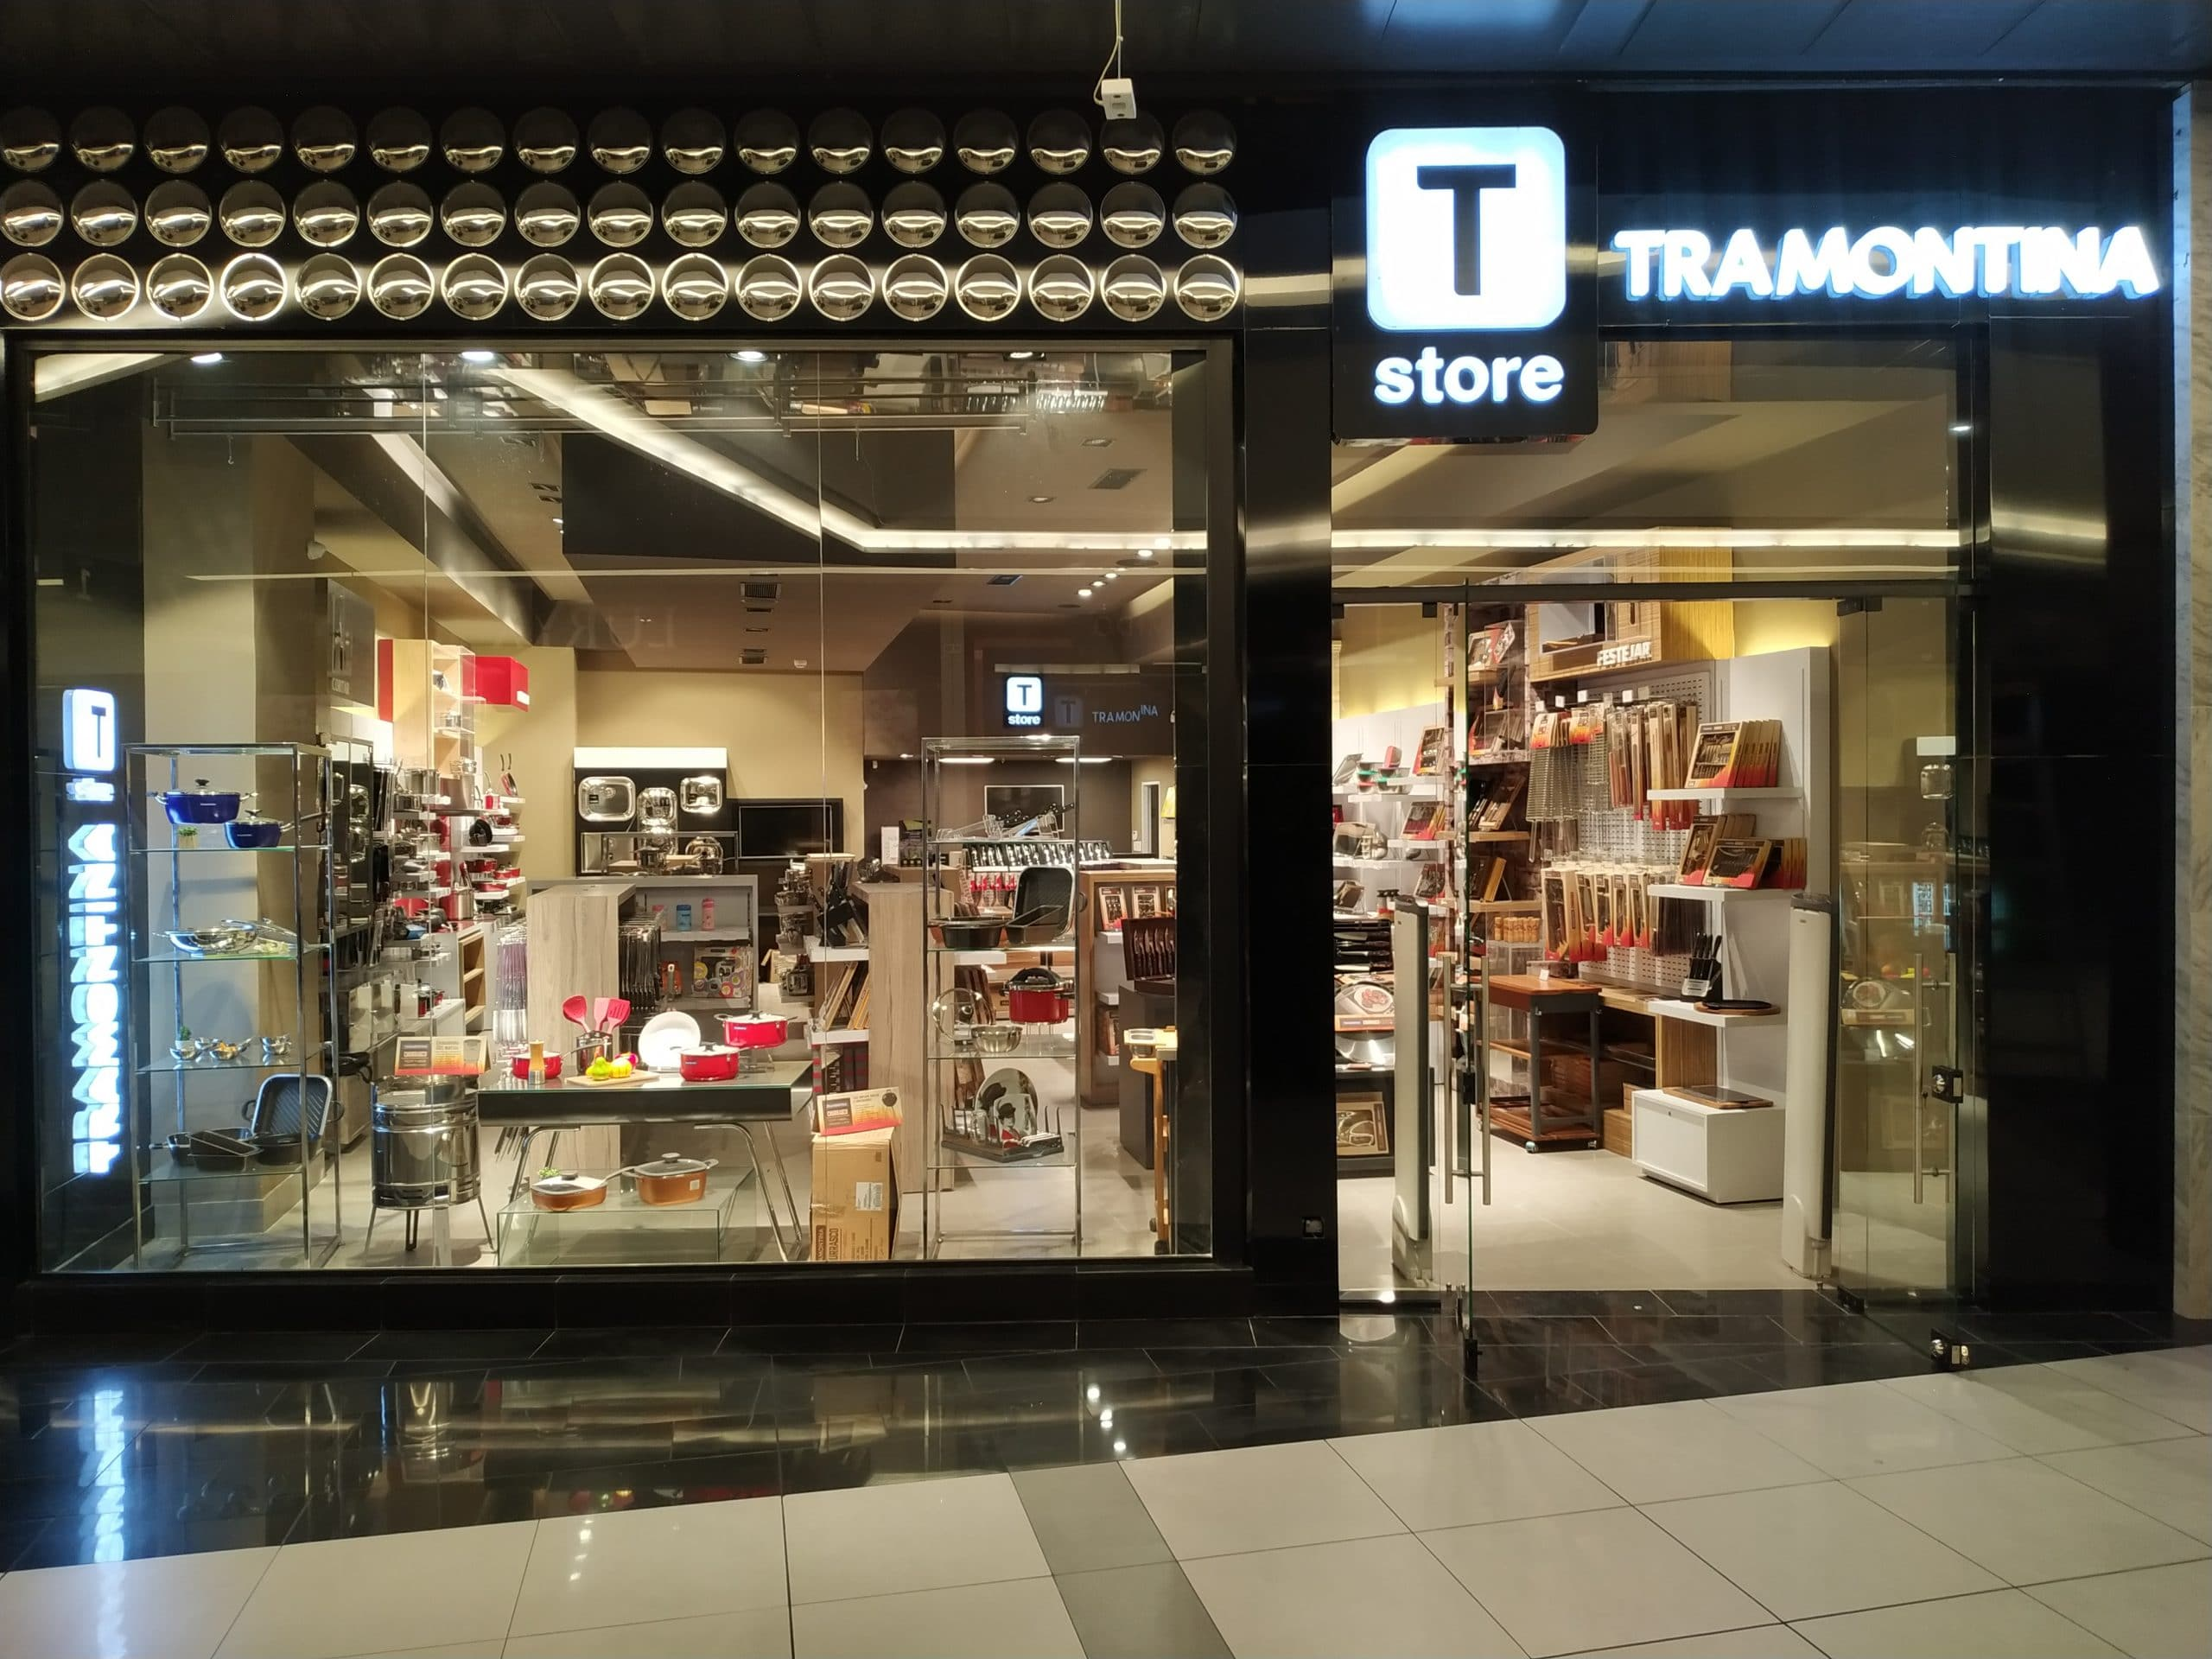 vitrinas comerciales - gluckmond